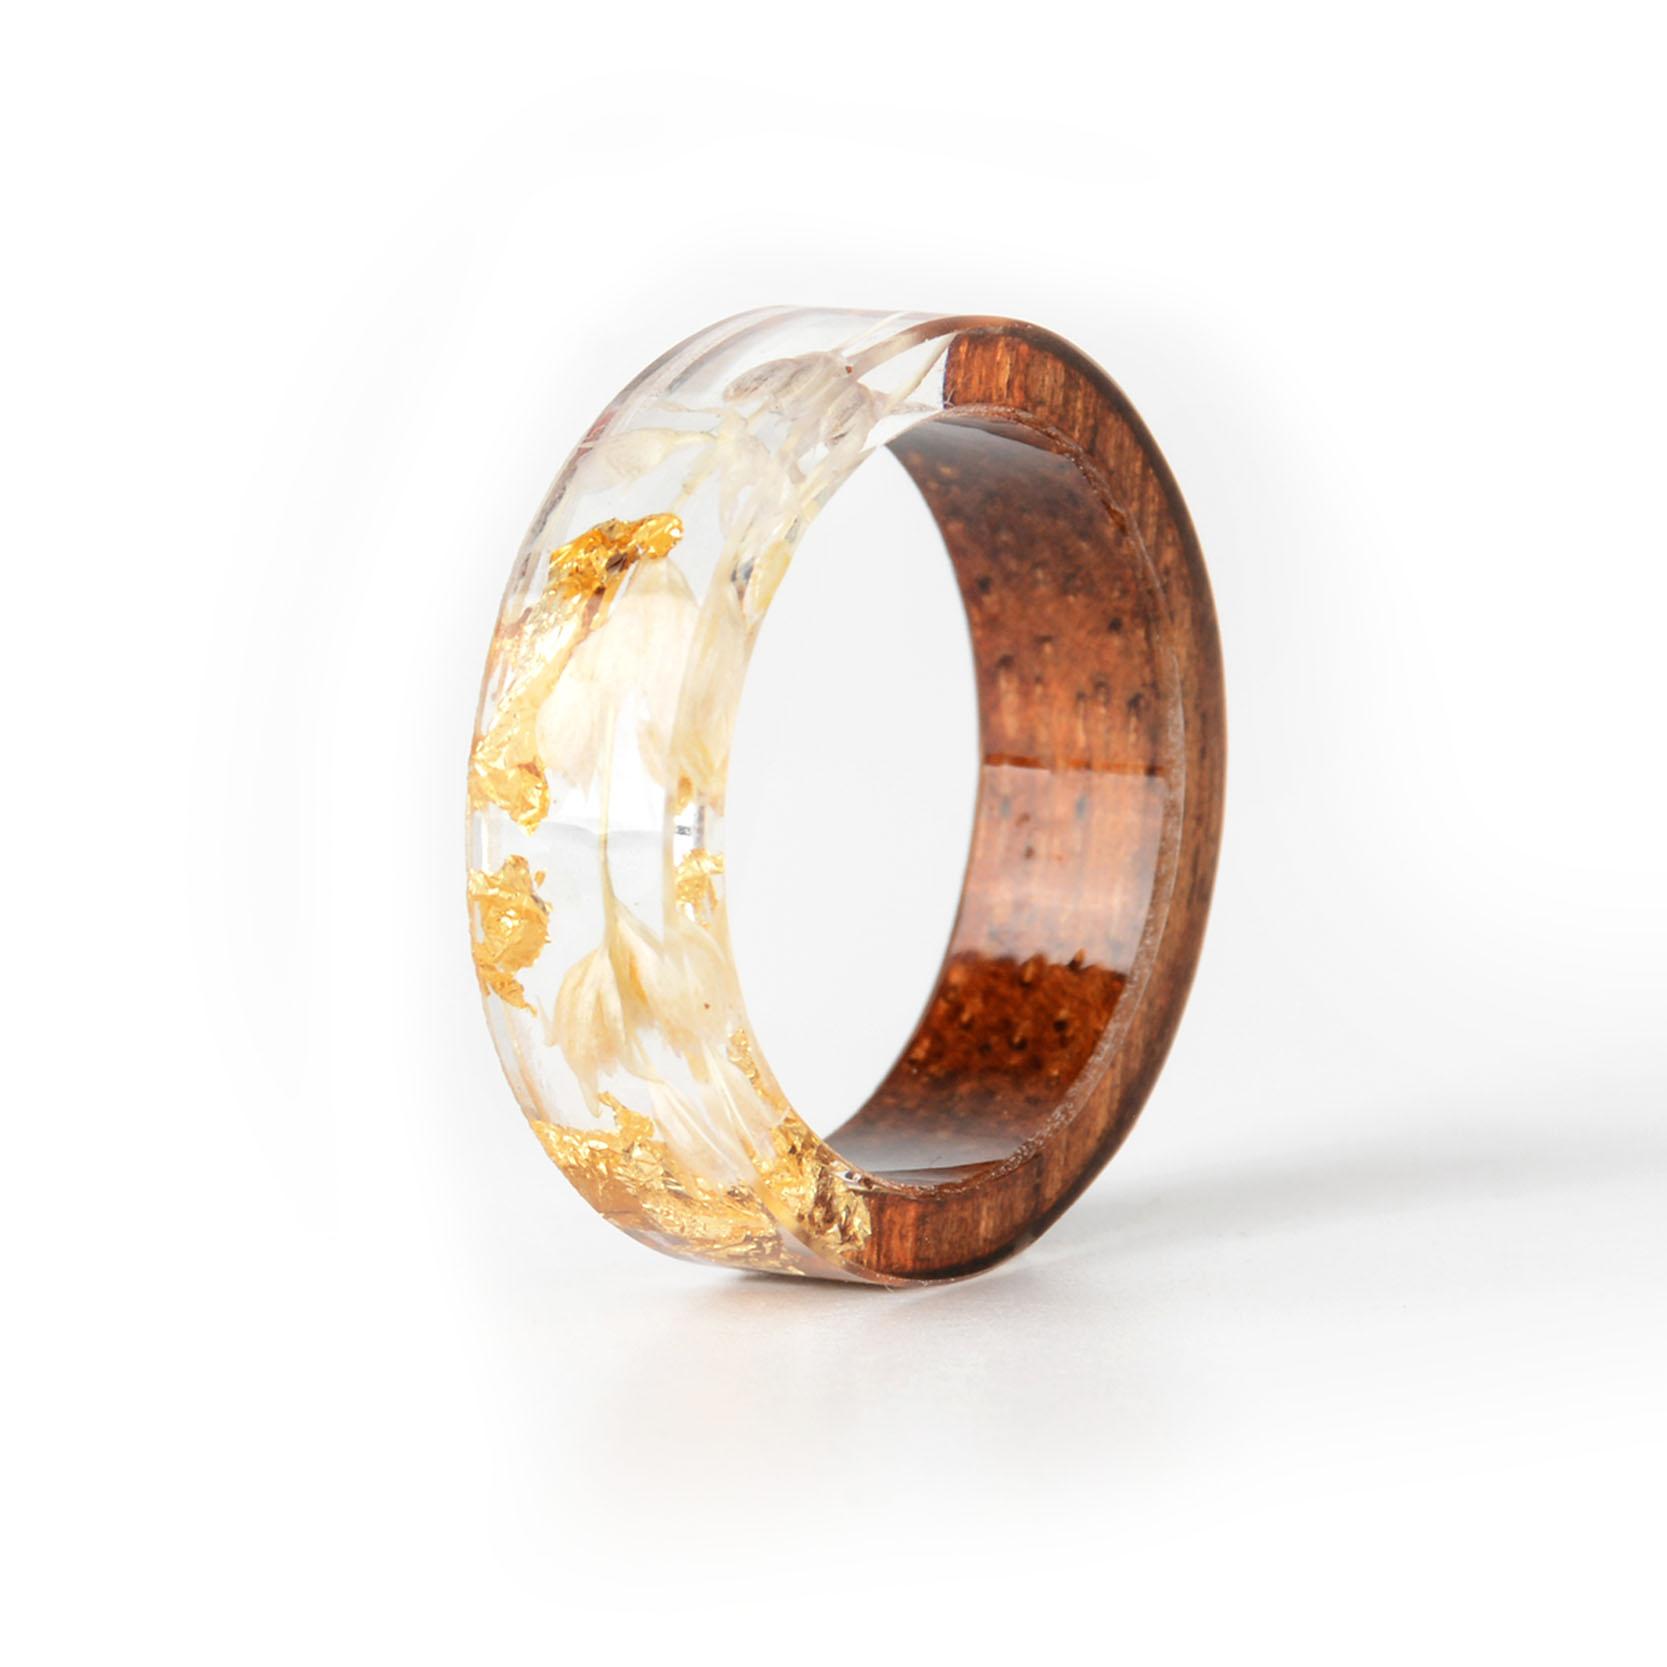 Handmade Wood Resin Ring Many Styles 29